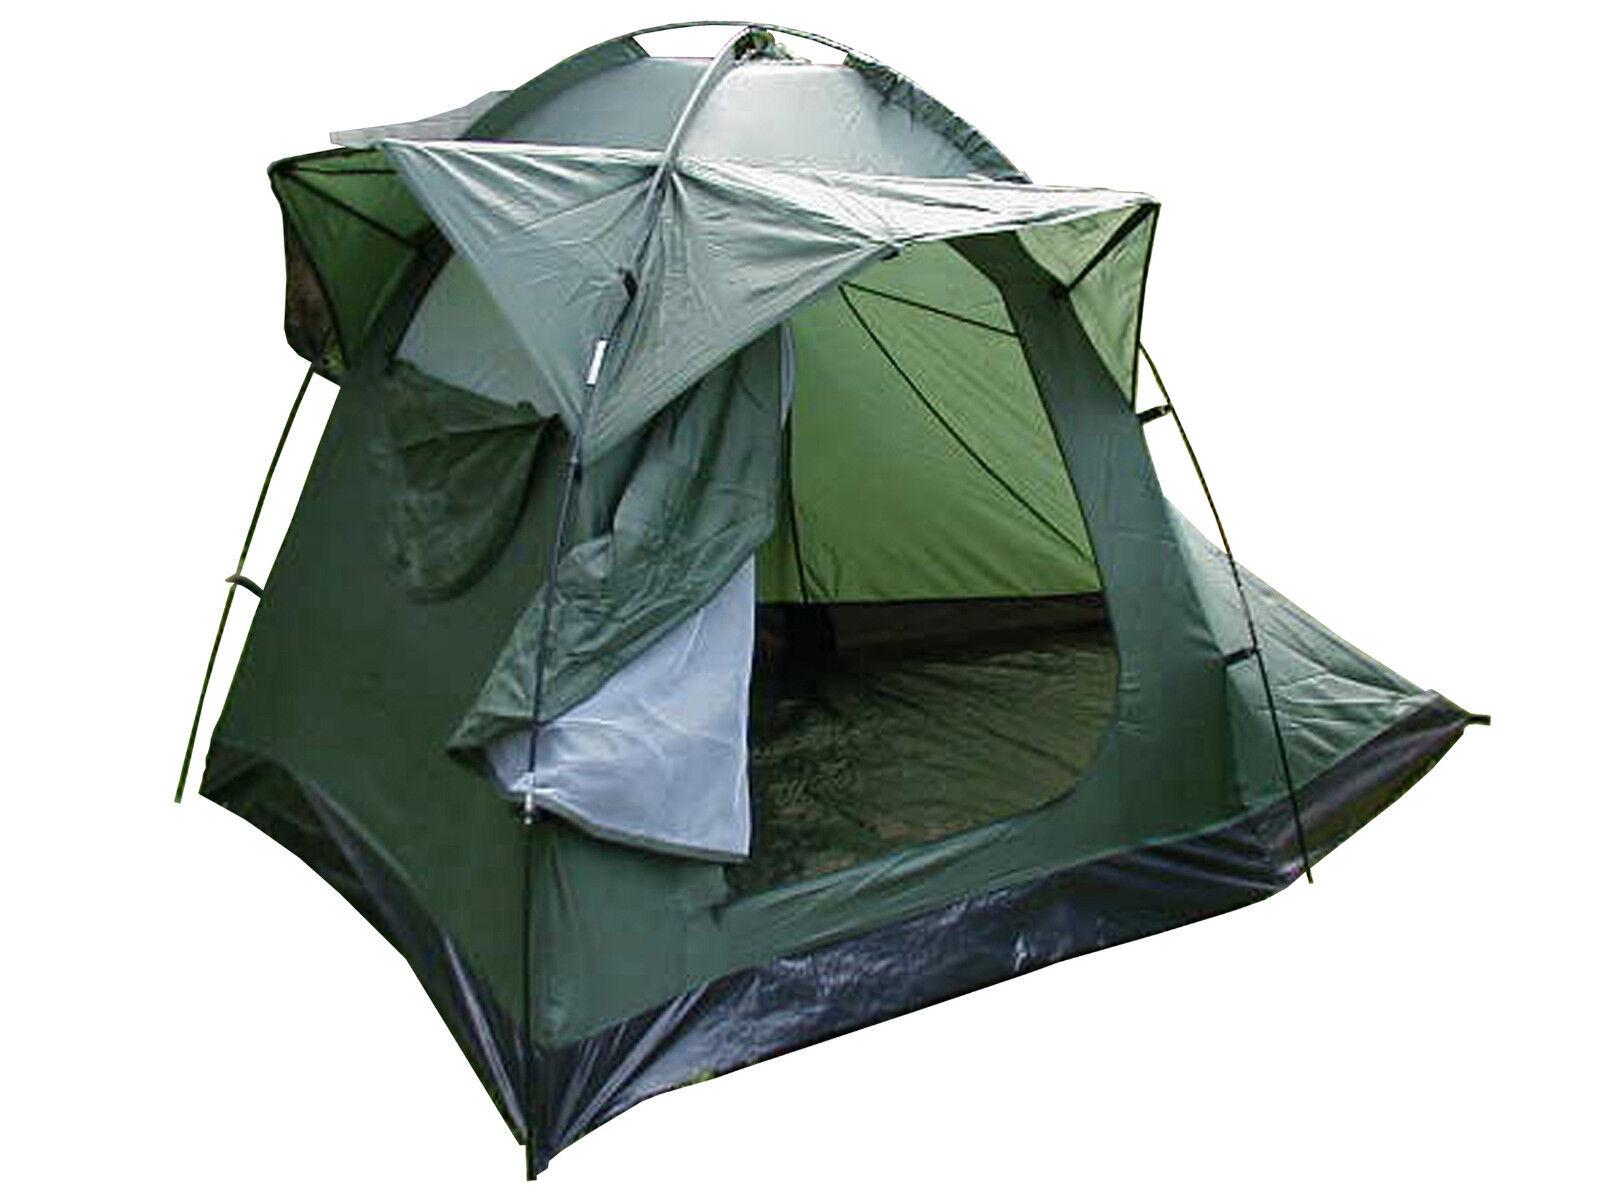 Olive Fisherman Camping Festival Outdoor 2 Men Nylon Tent